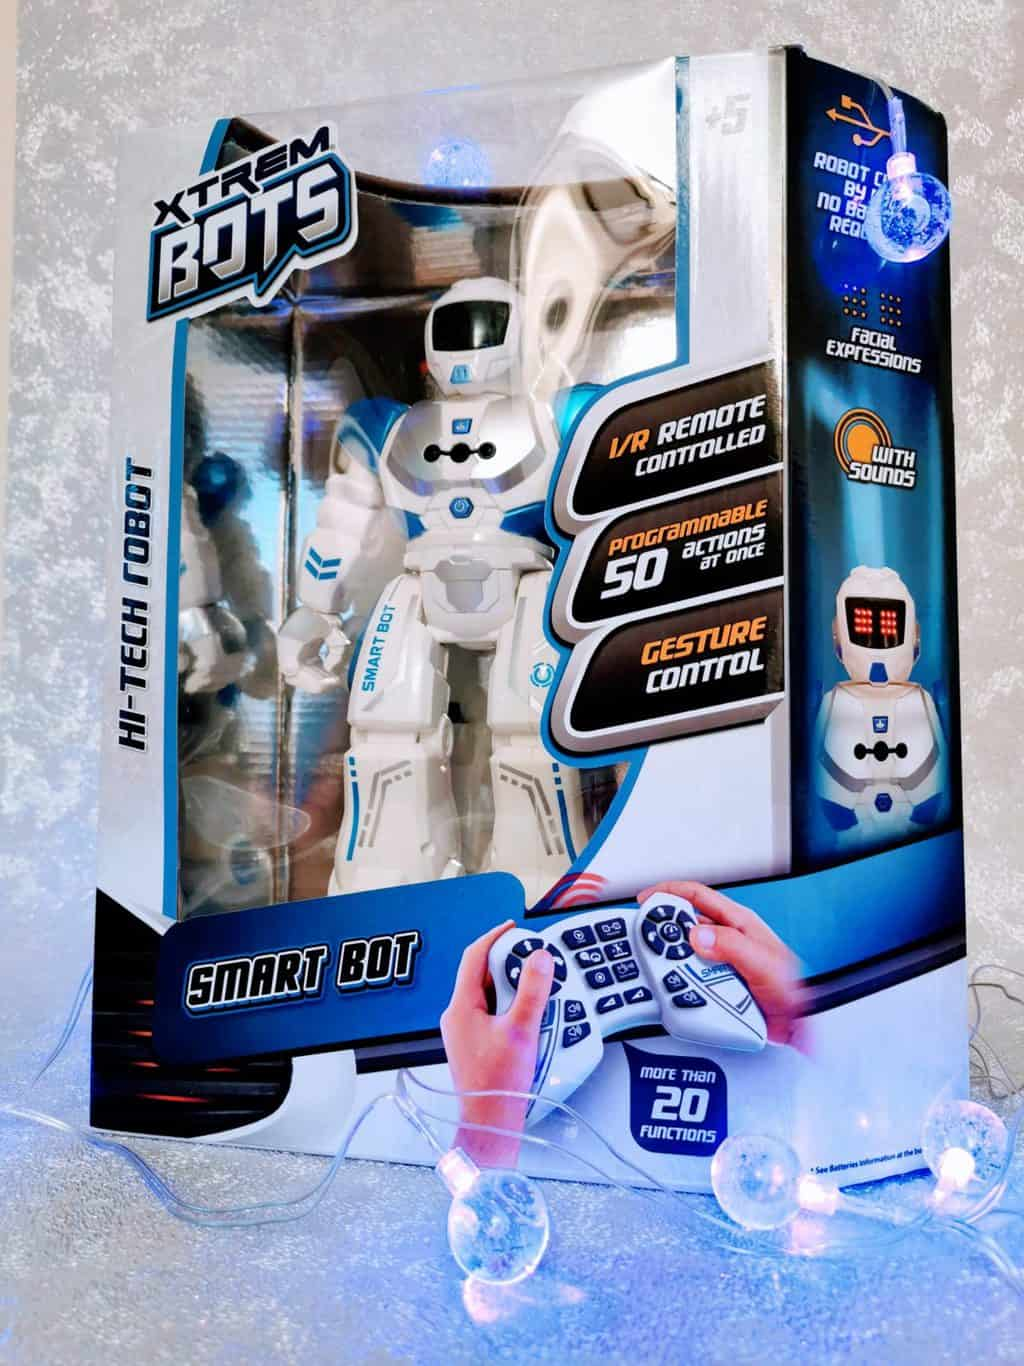 Xtrem Smart Bot